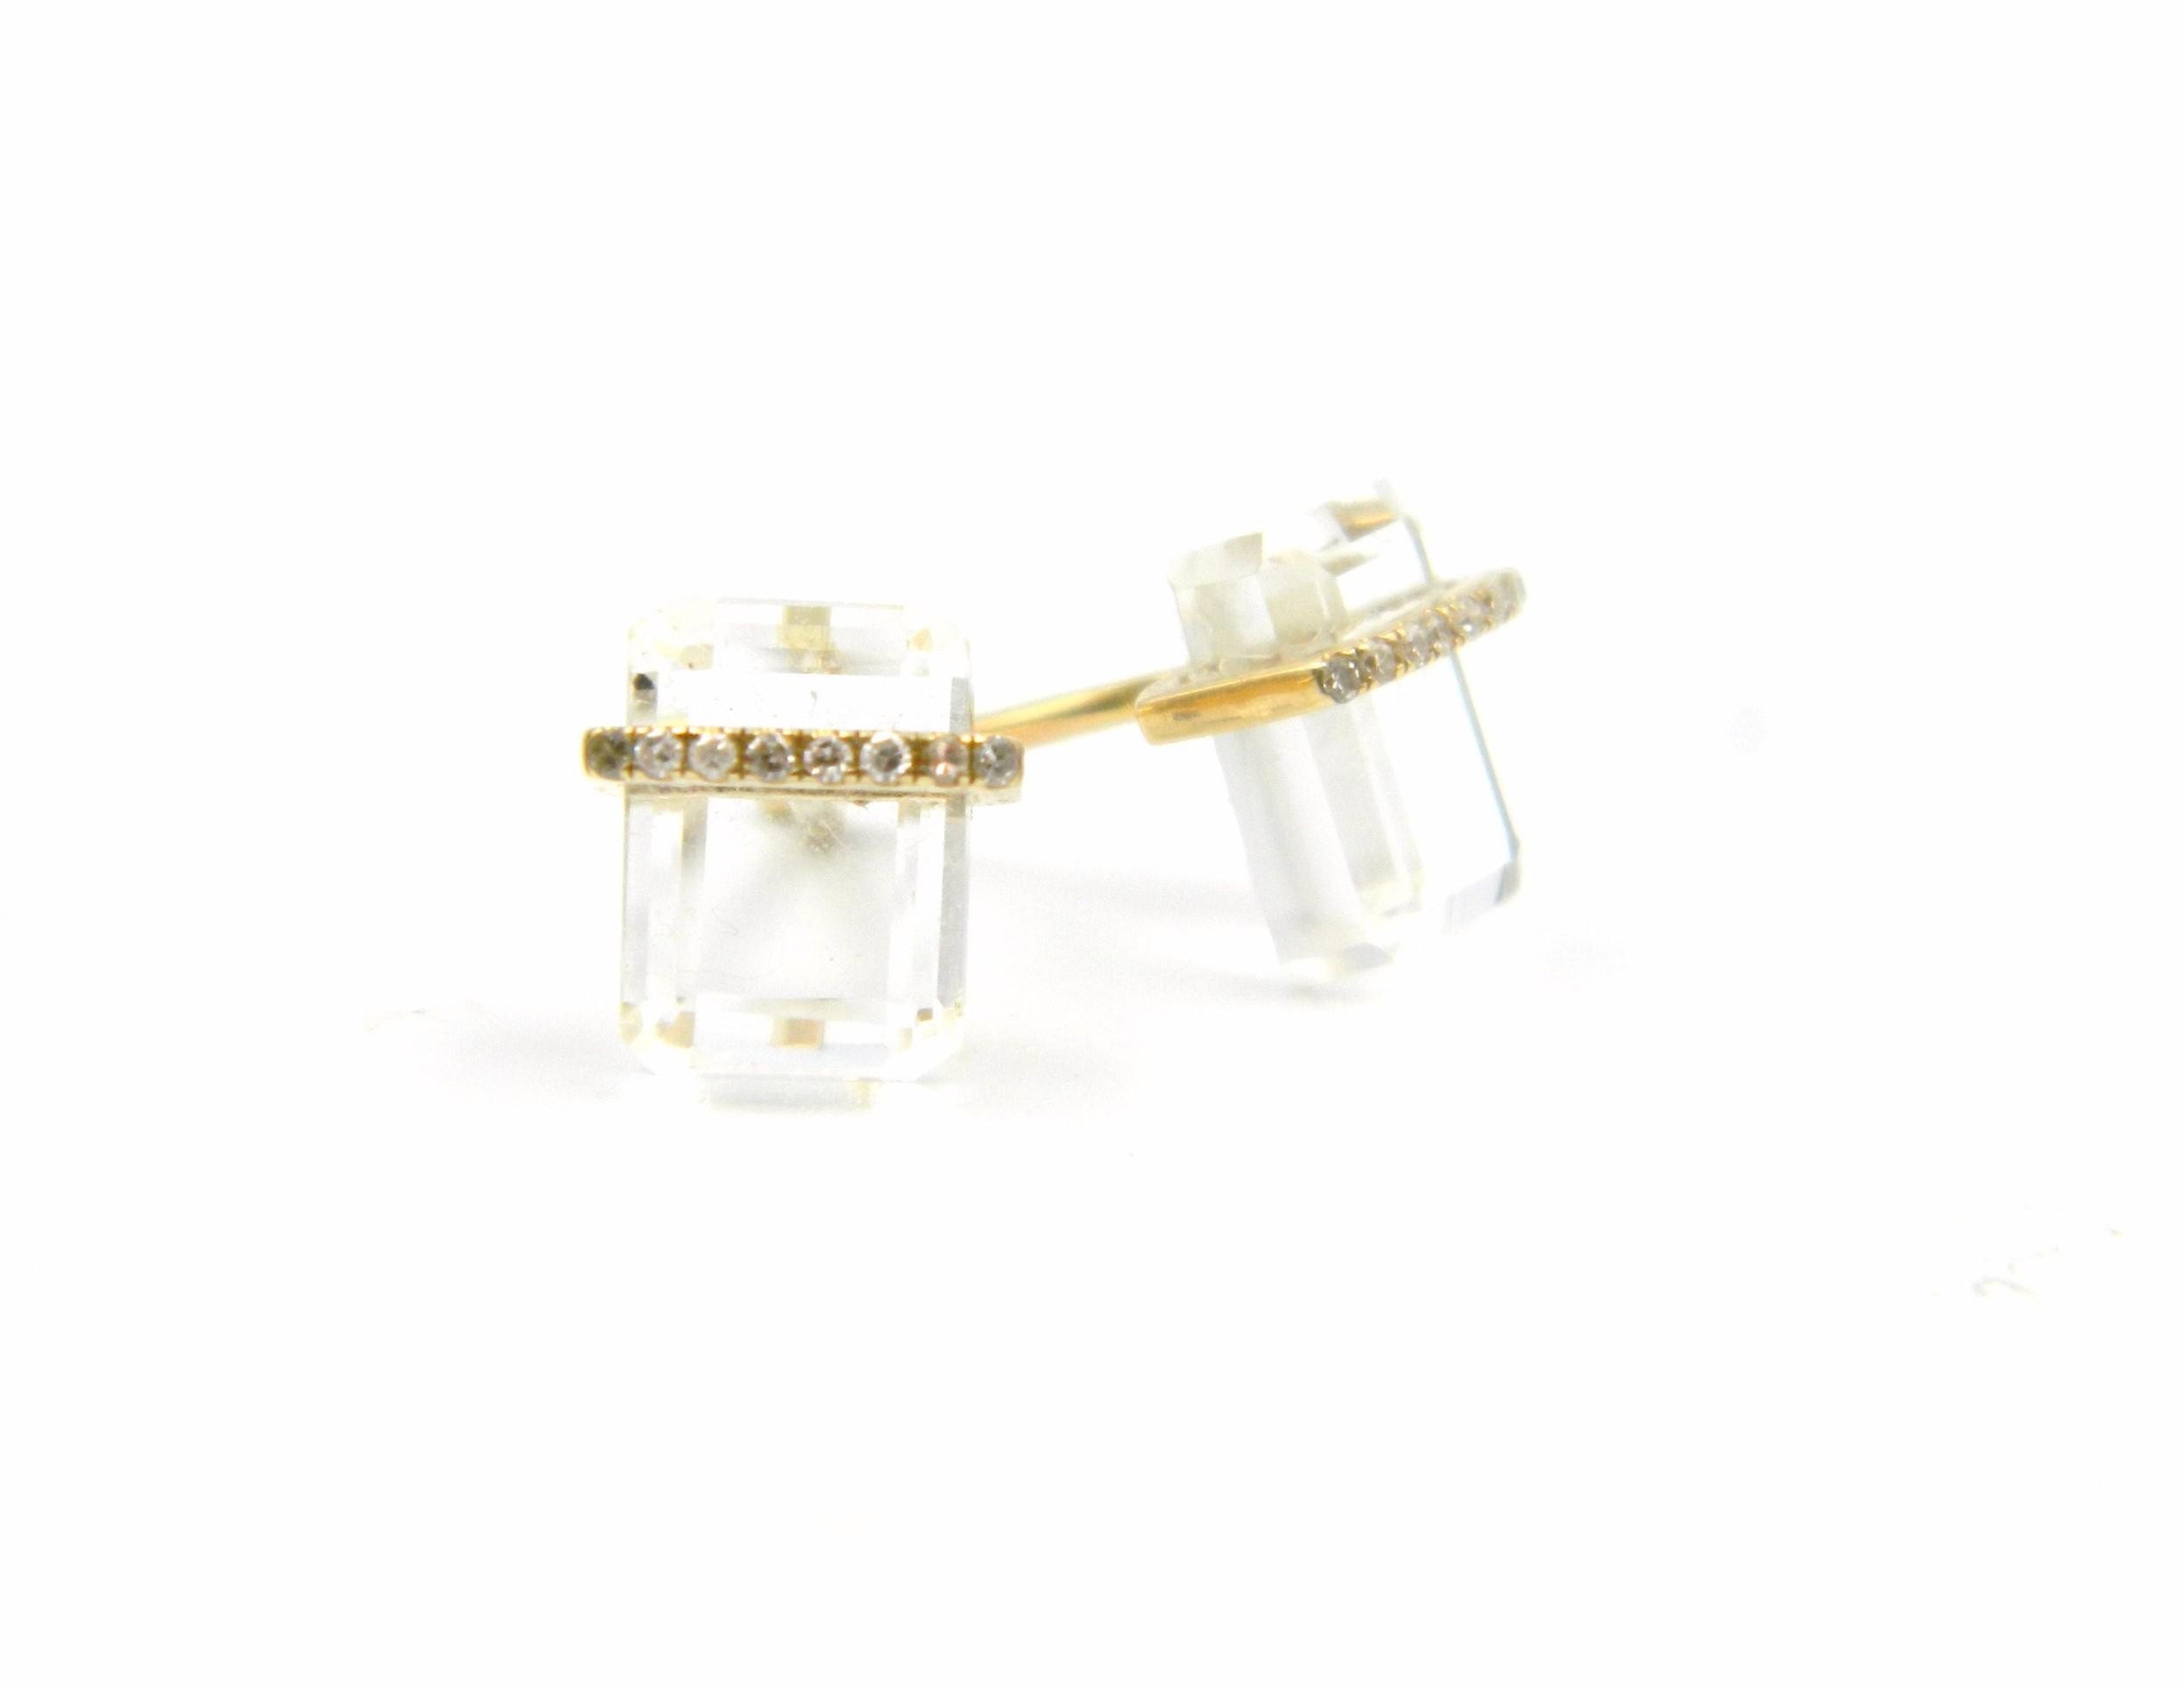 Yellow Gold White Topaz Earrings